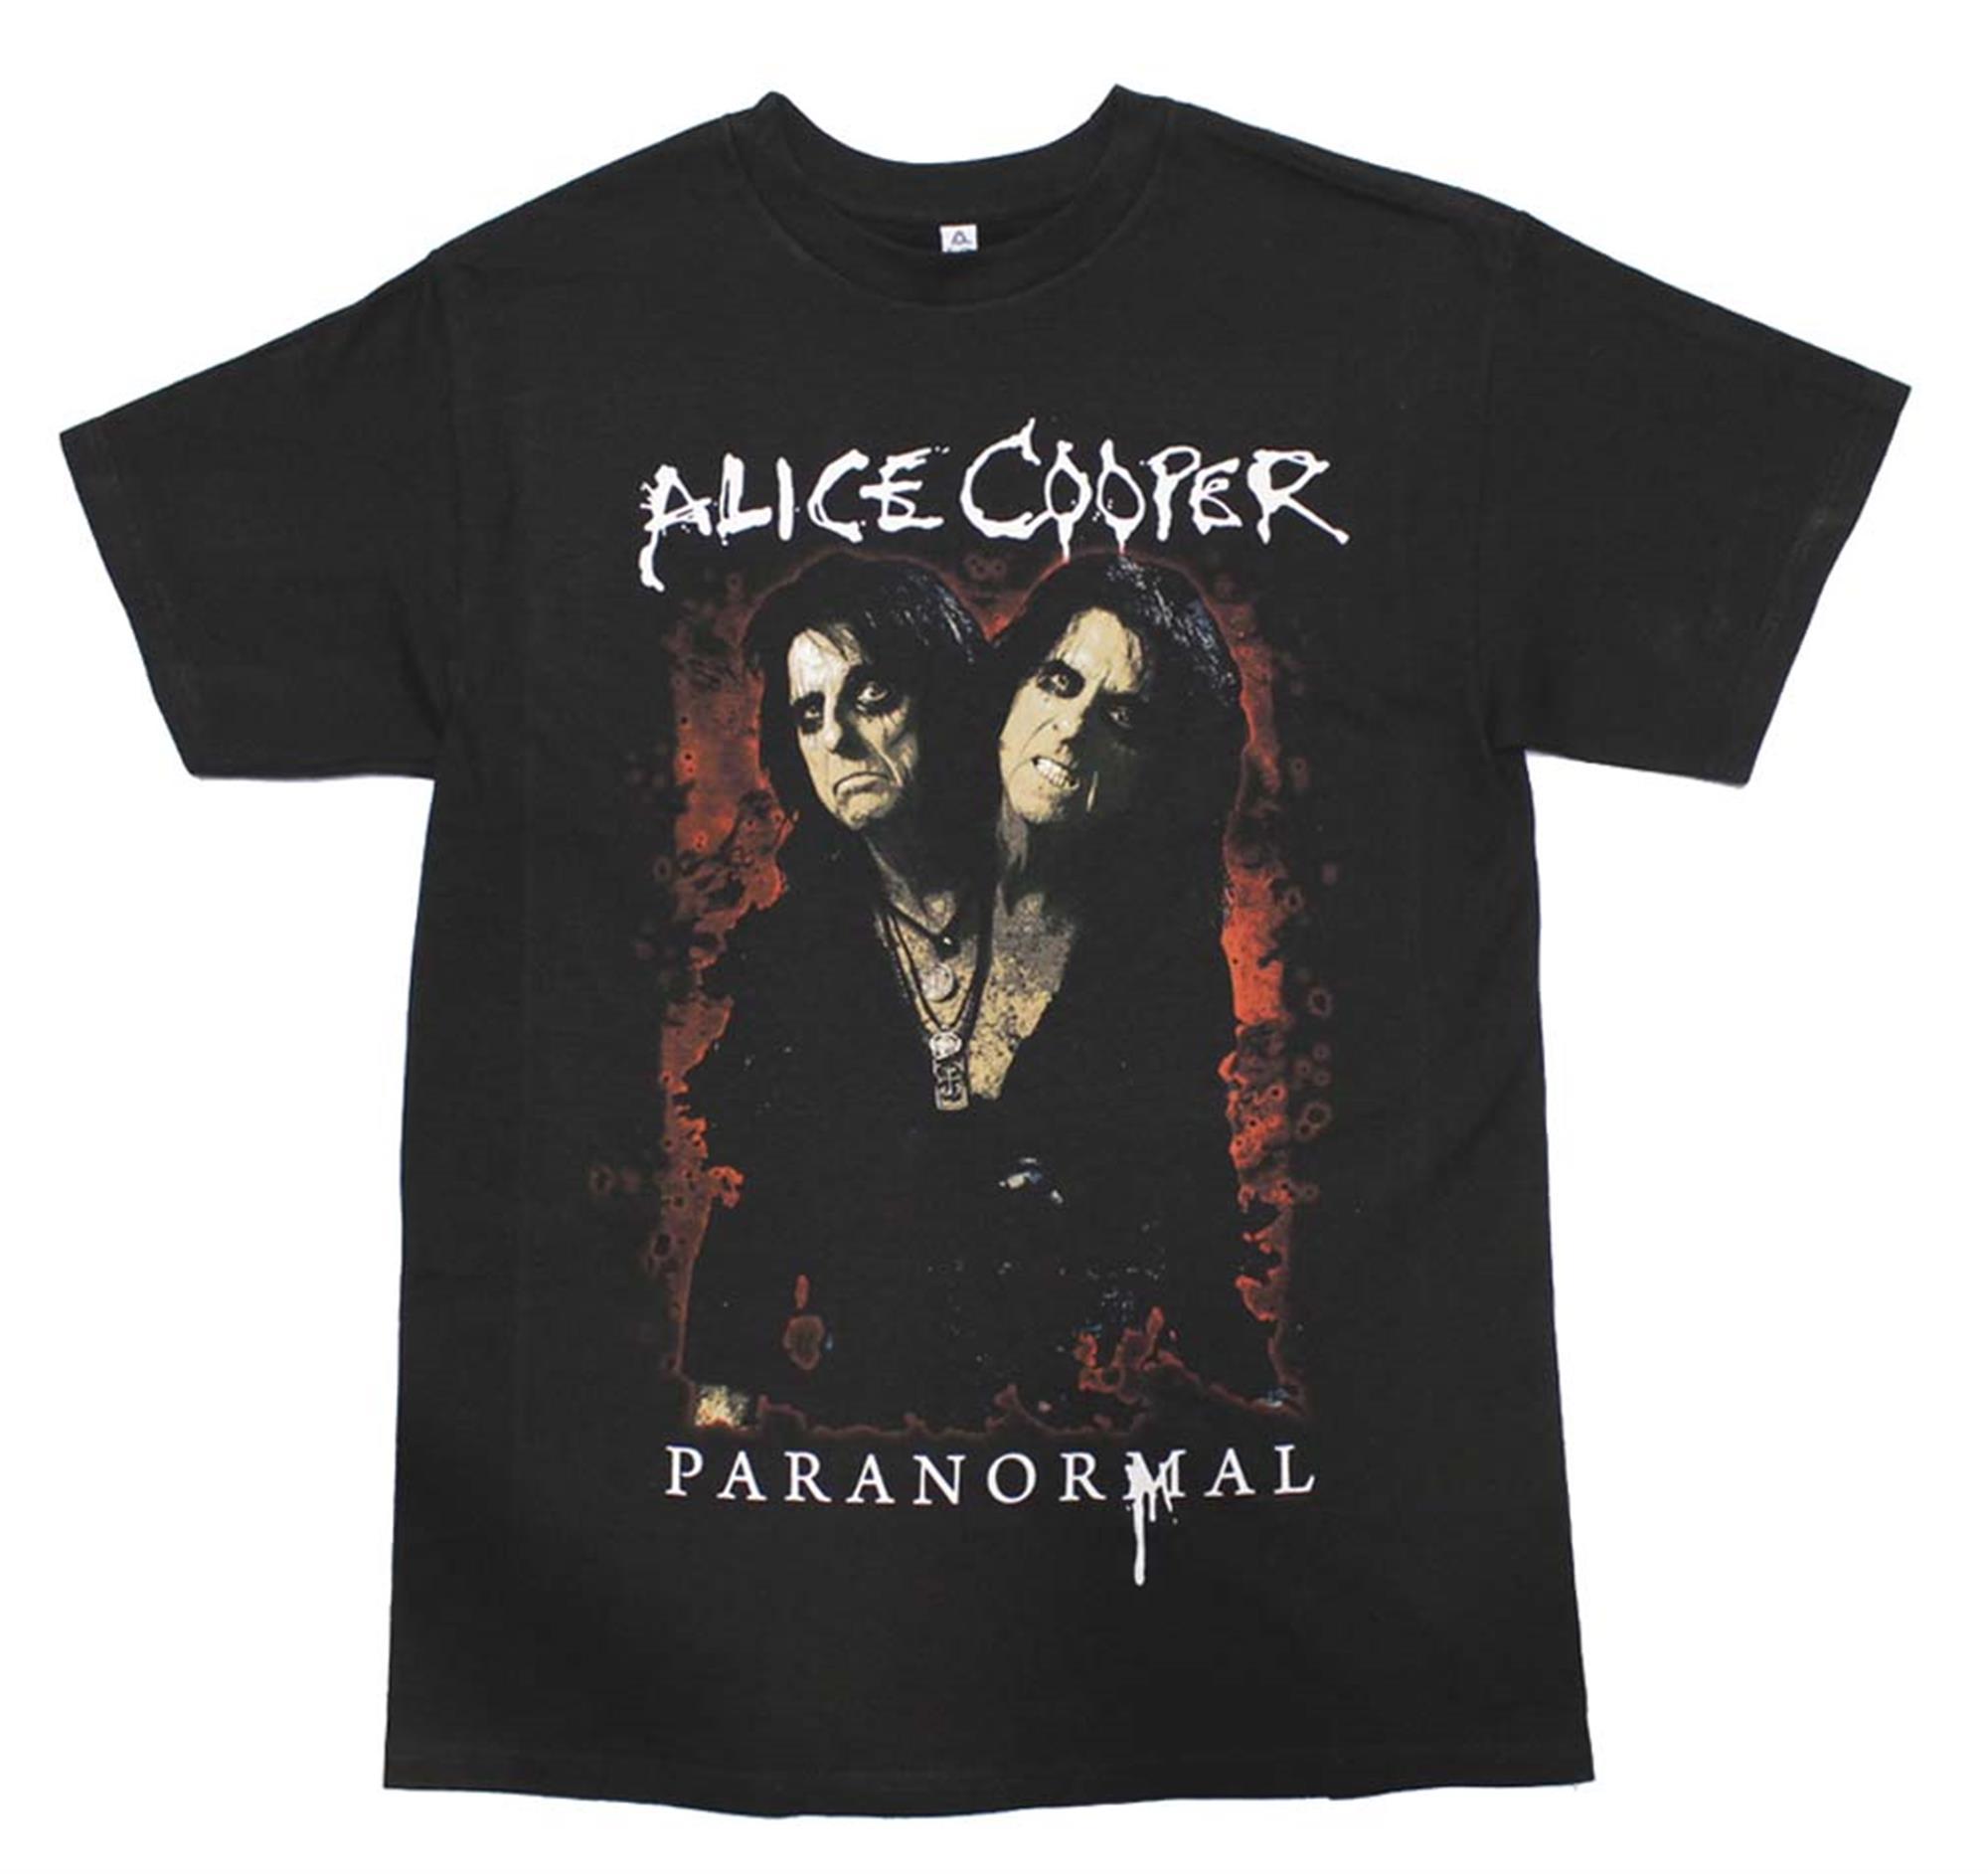 Alice Cooper Paranormal T-Shirt